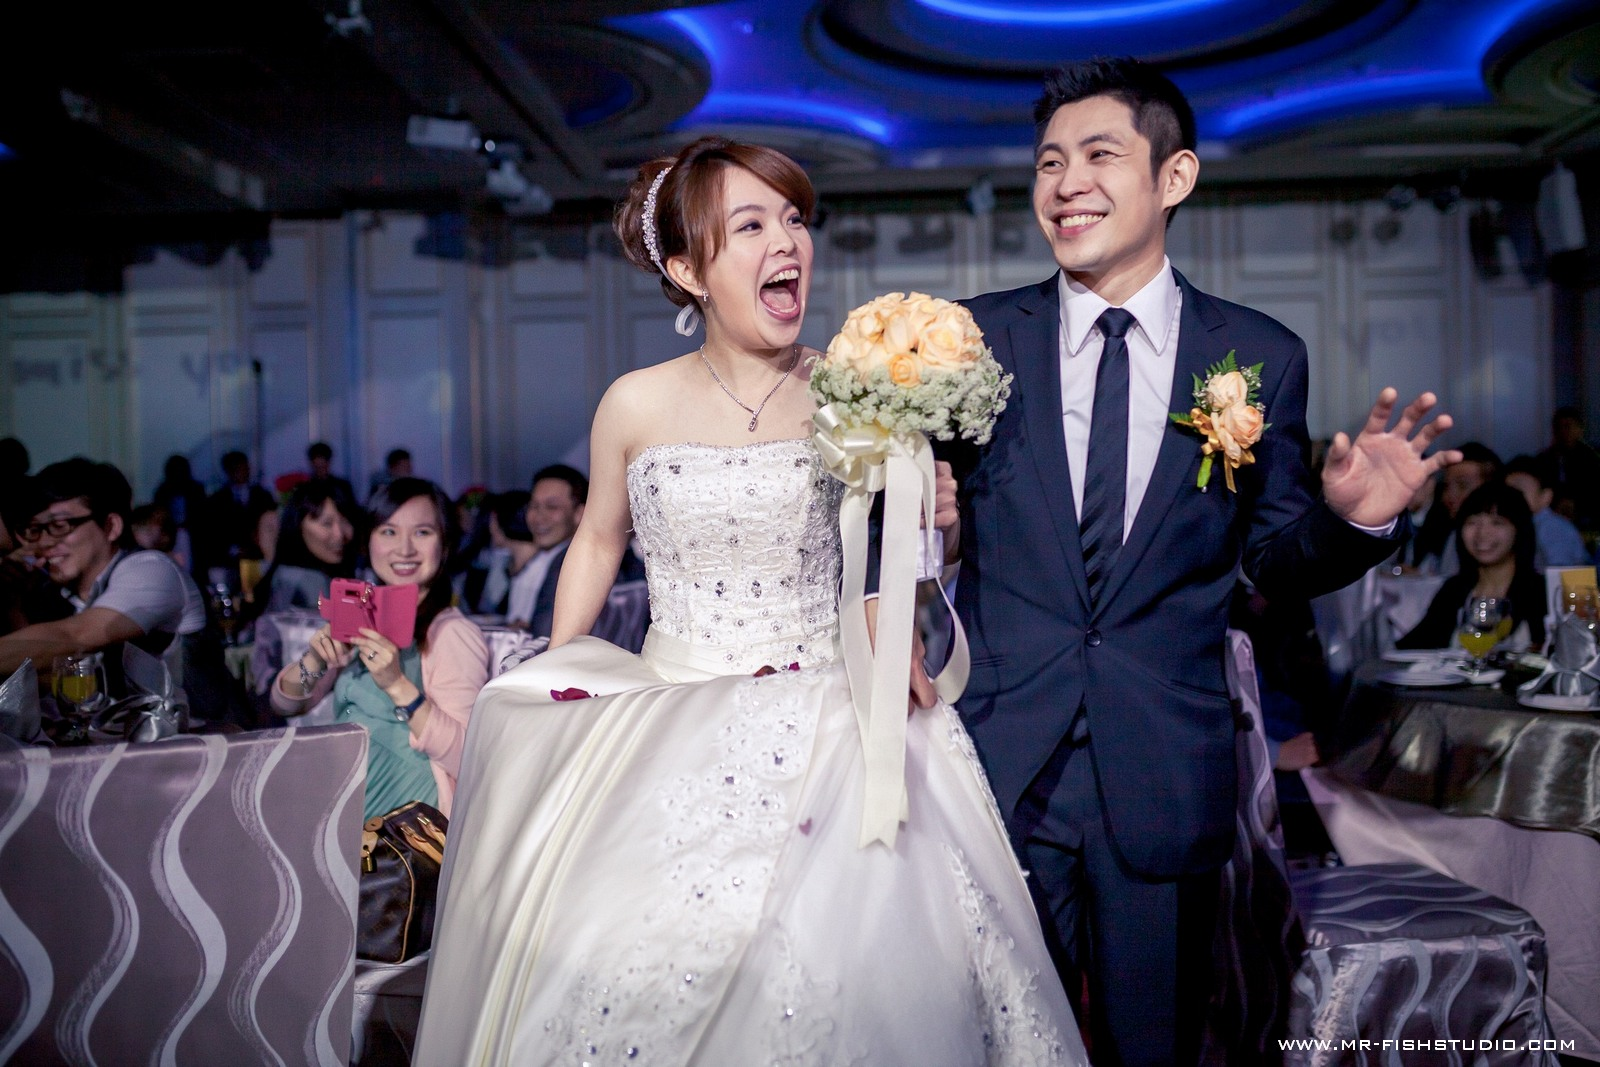 【Wedding】芳妤+俊翰婚禮精選